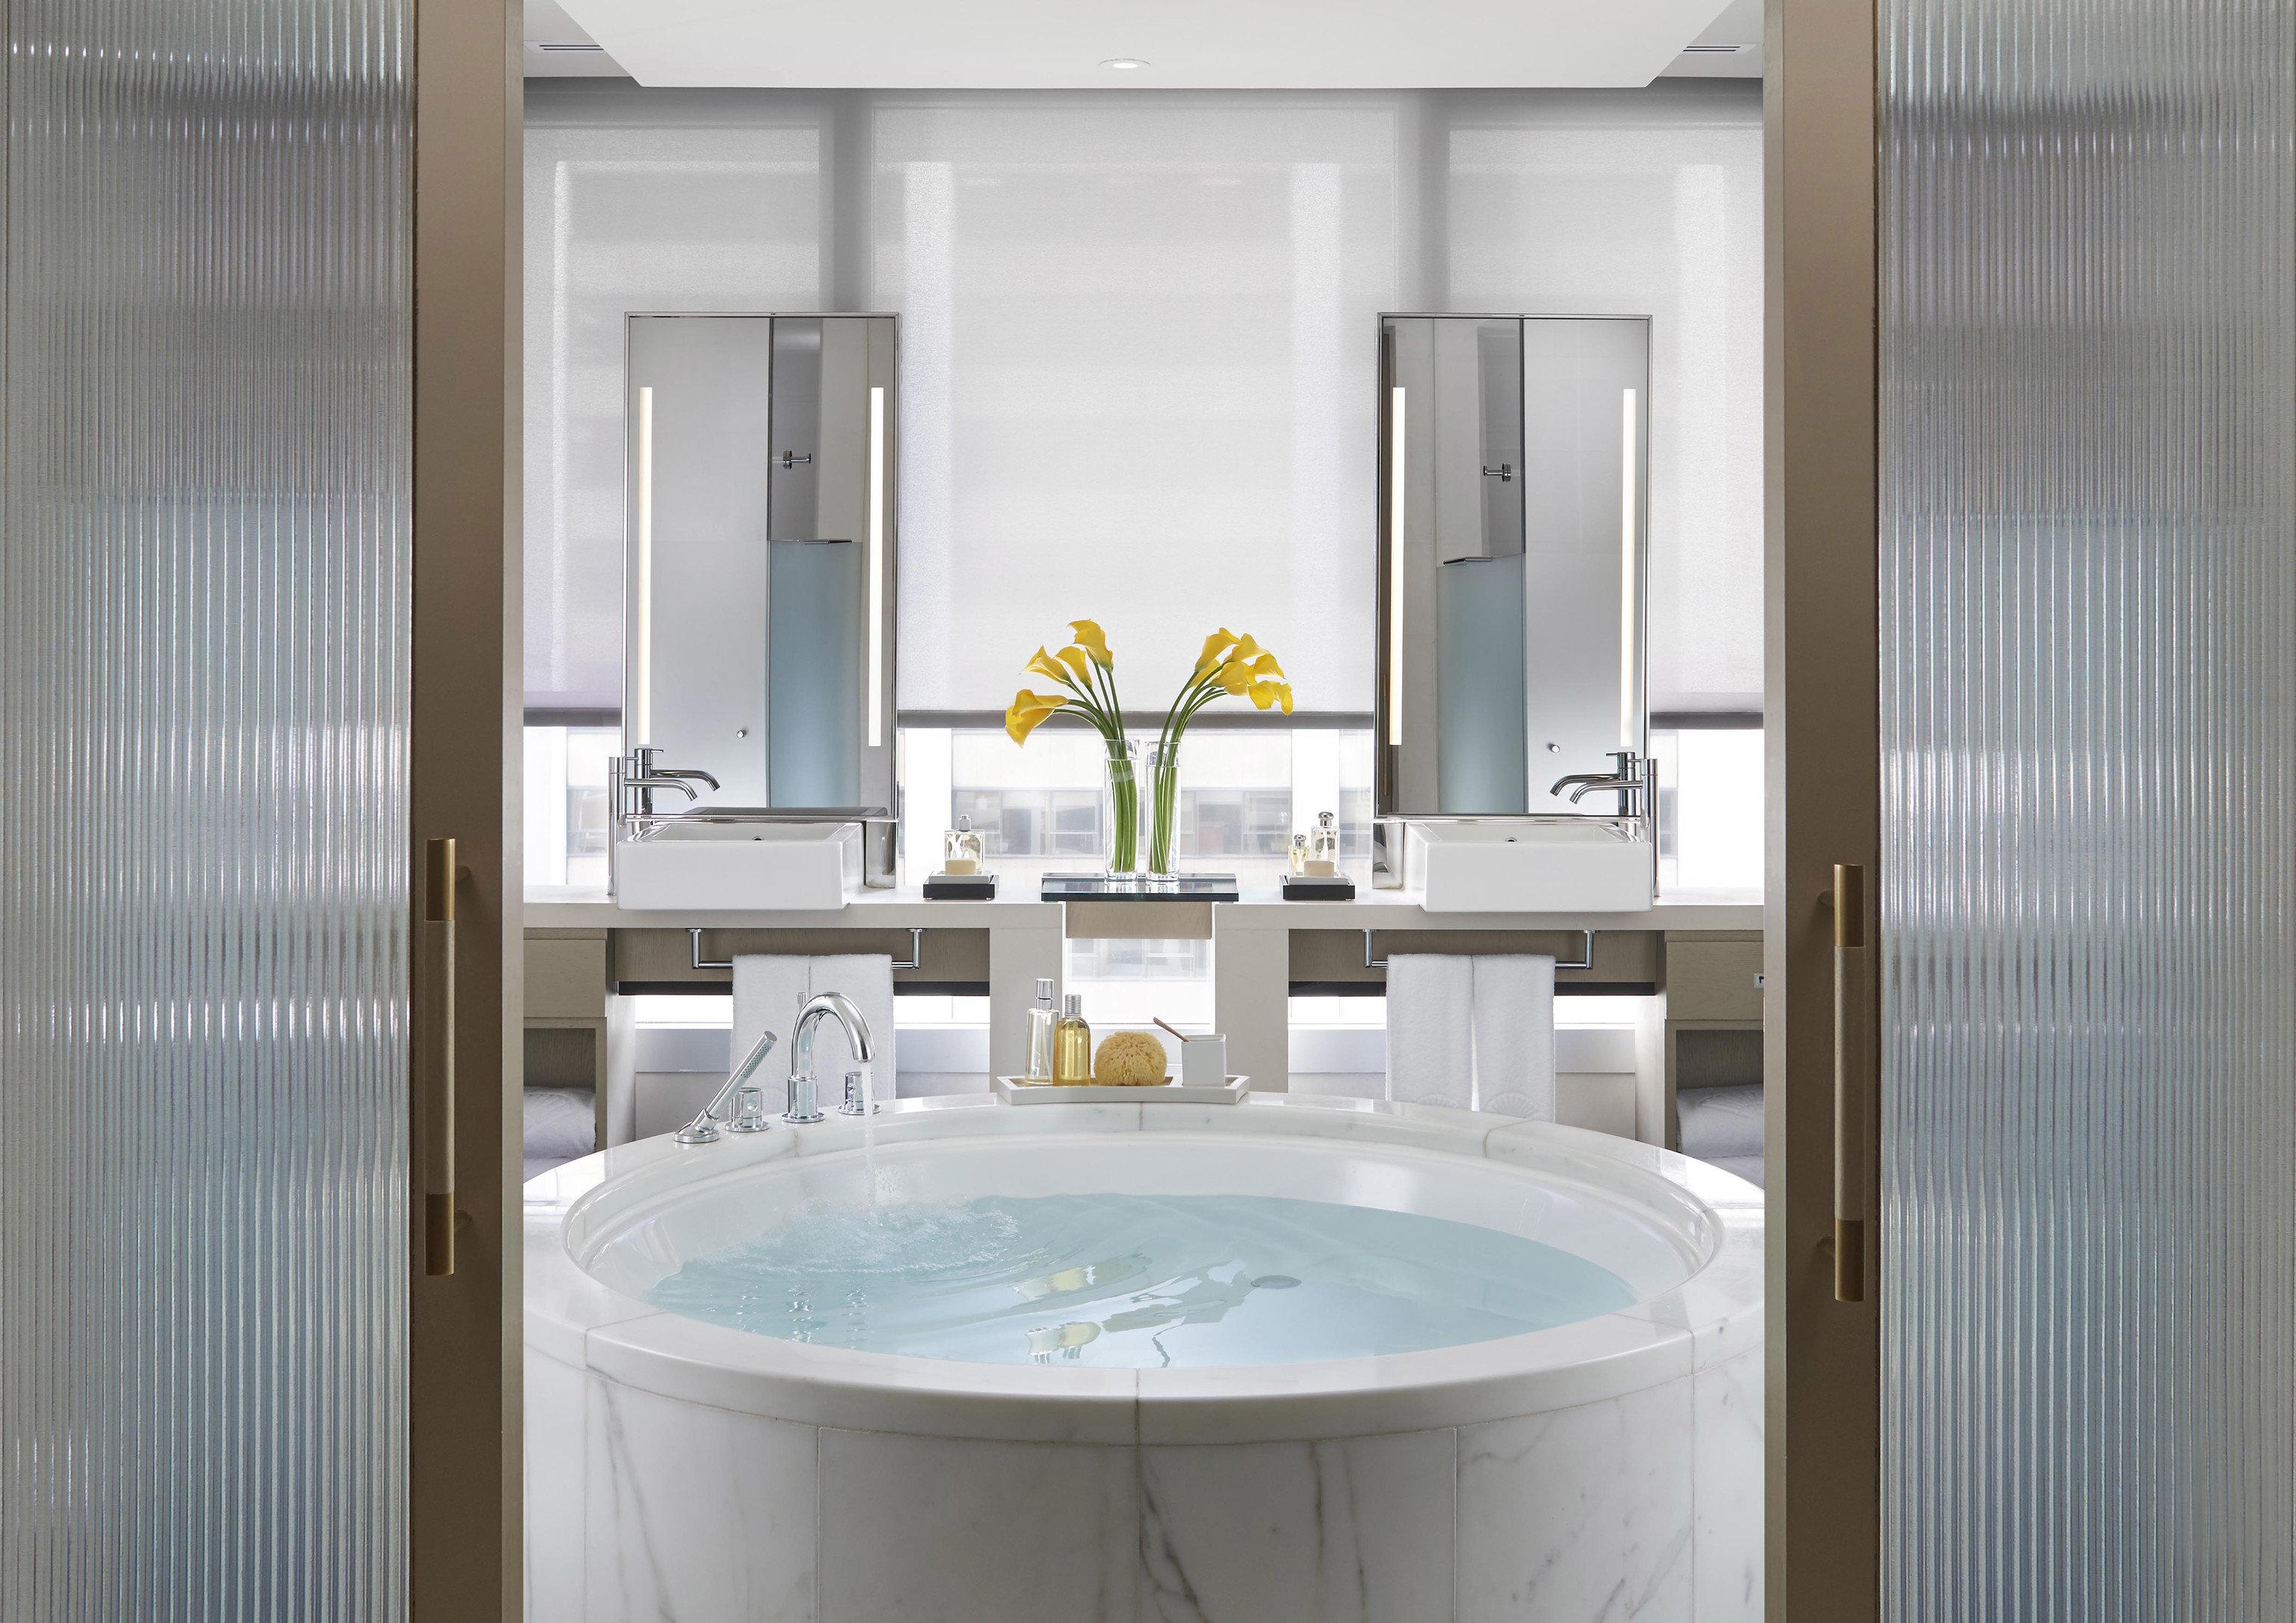 Hotels bathroom indoor wall window room property sink bathtub interior design shower floor white home swimming pool plumbing fixture Design Suite apartment tub Bath